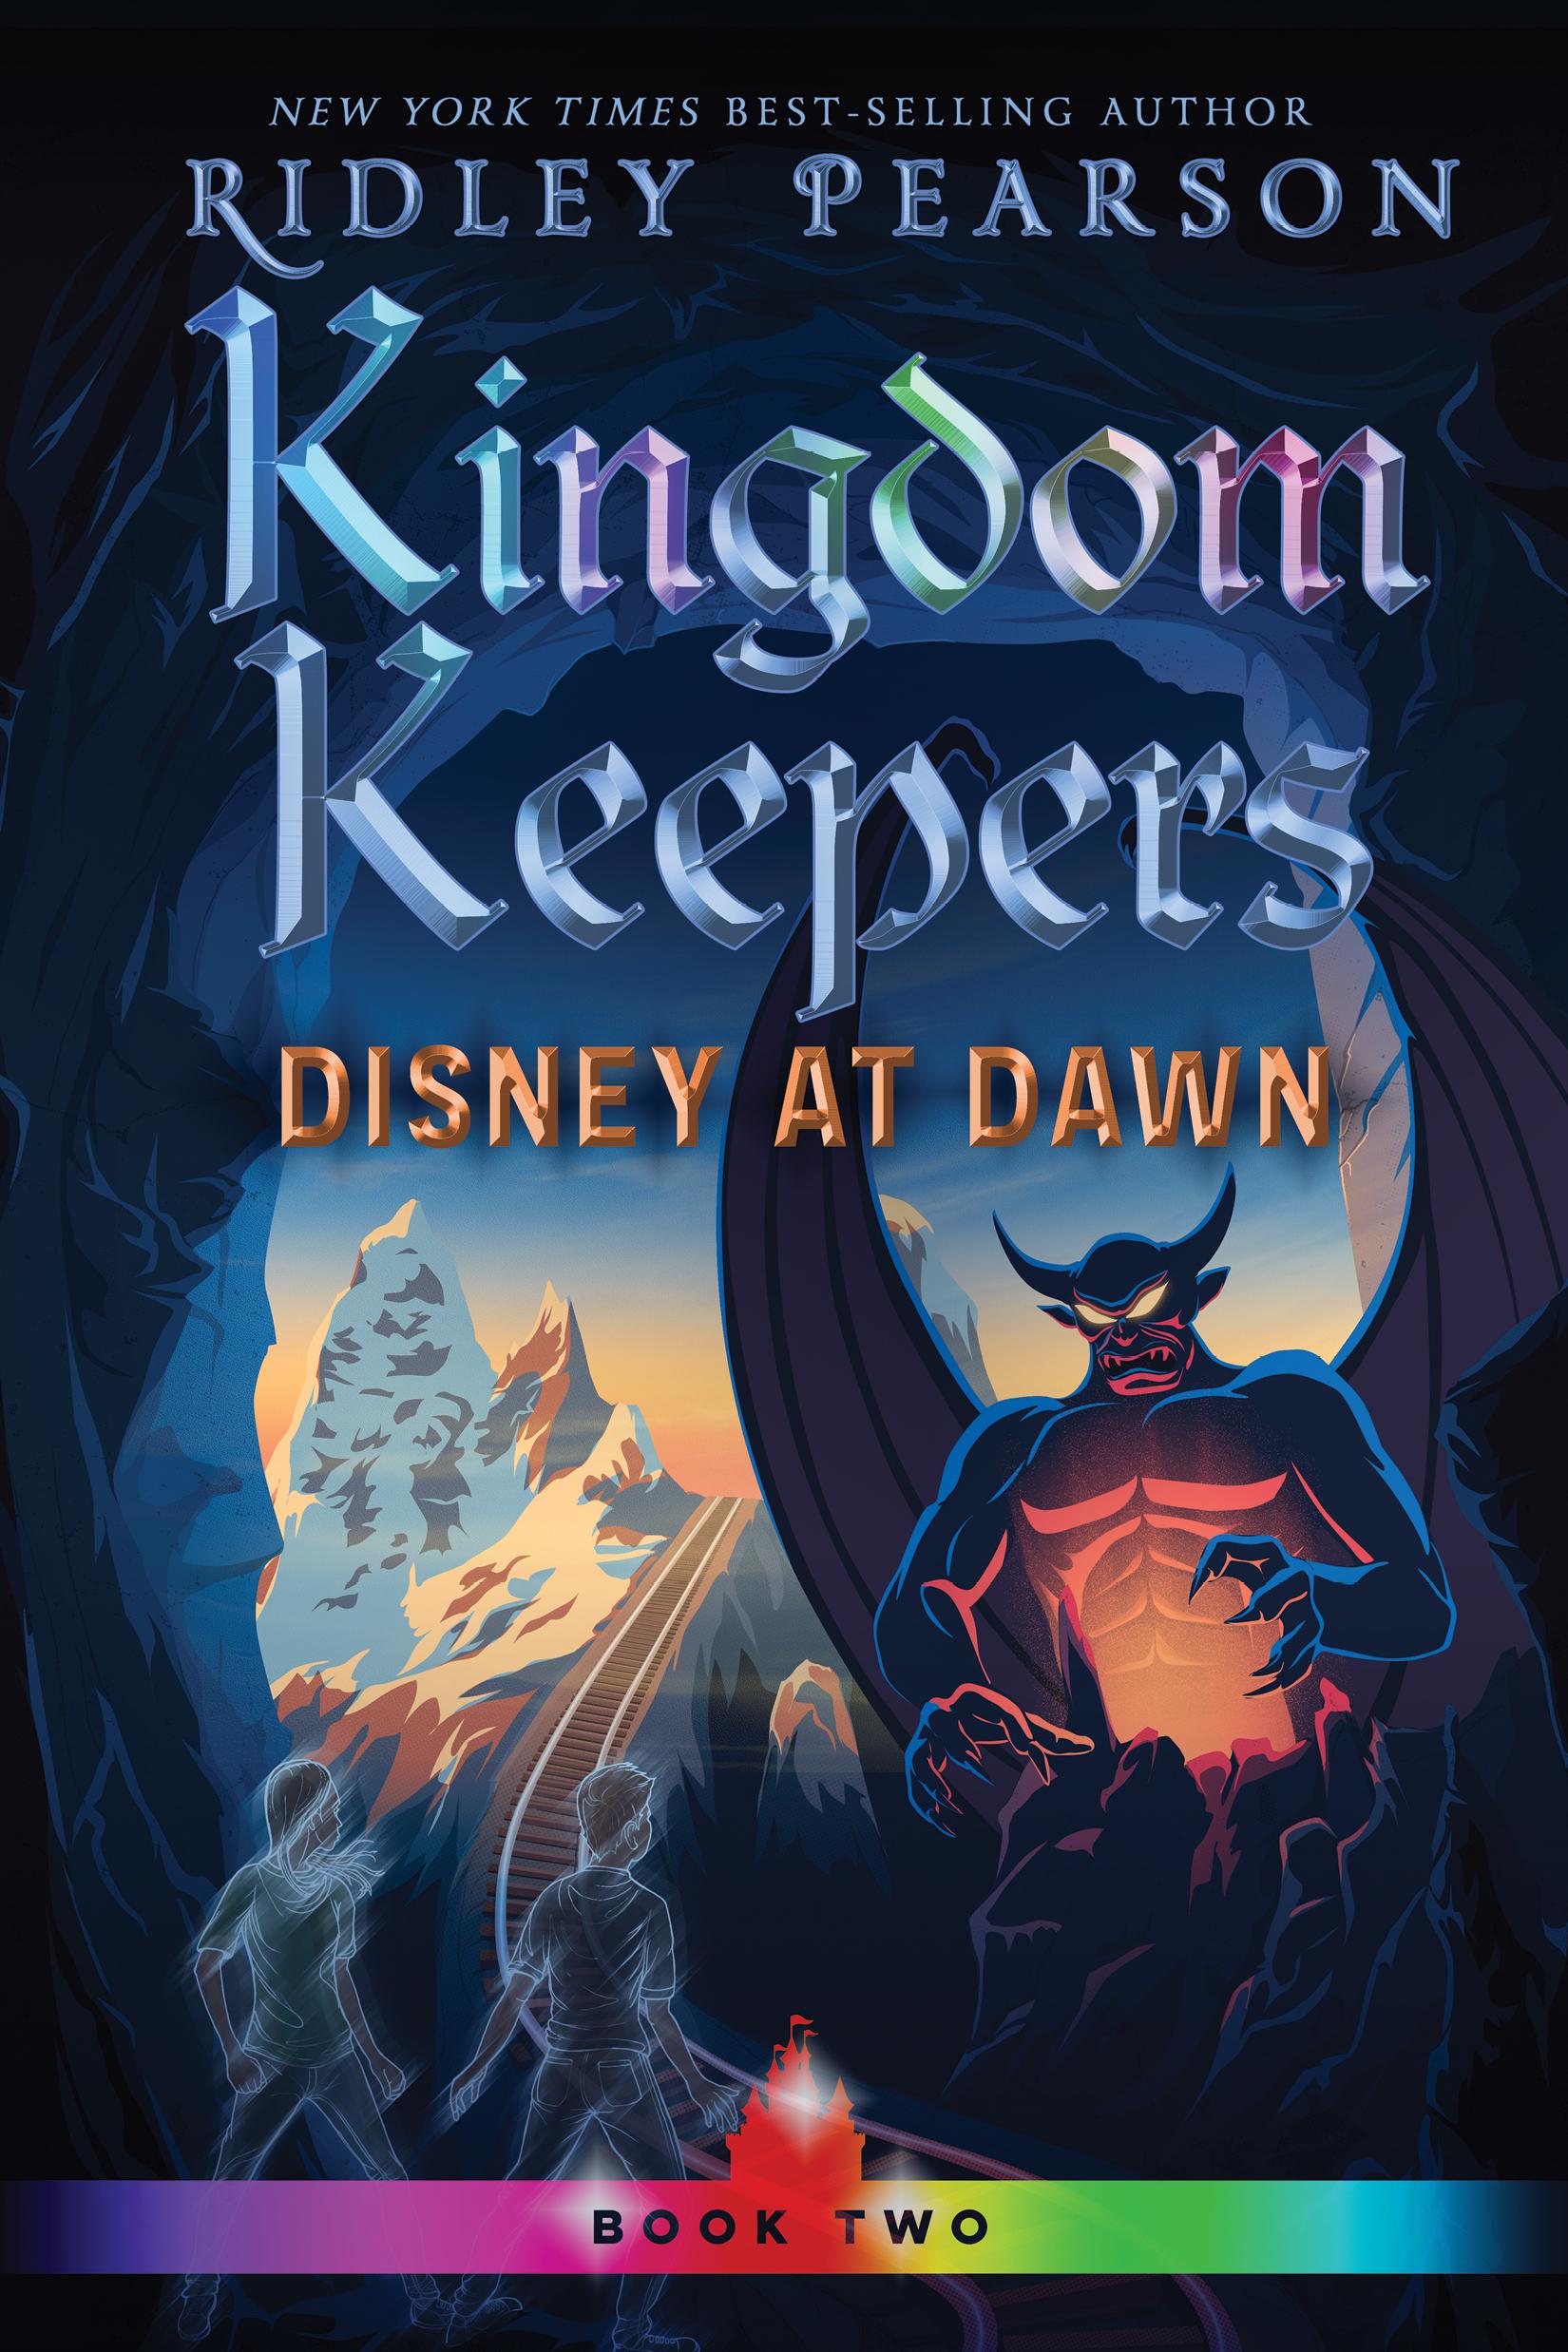 Kingdom Keepers II (Volume 2) Disney at Dawn